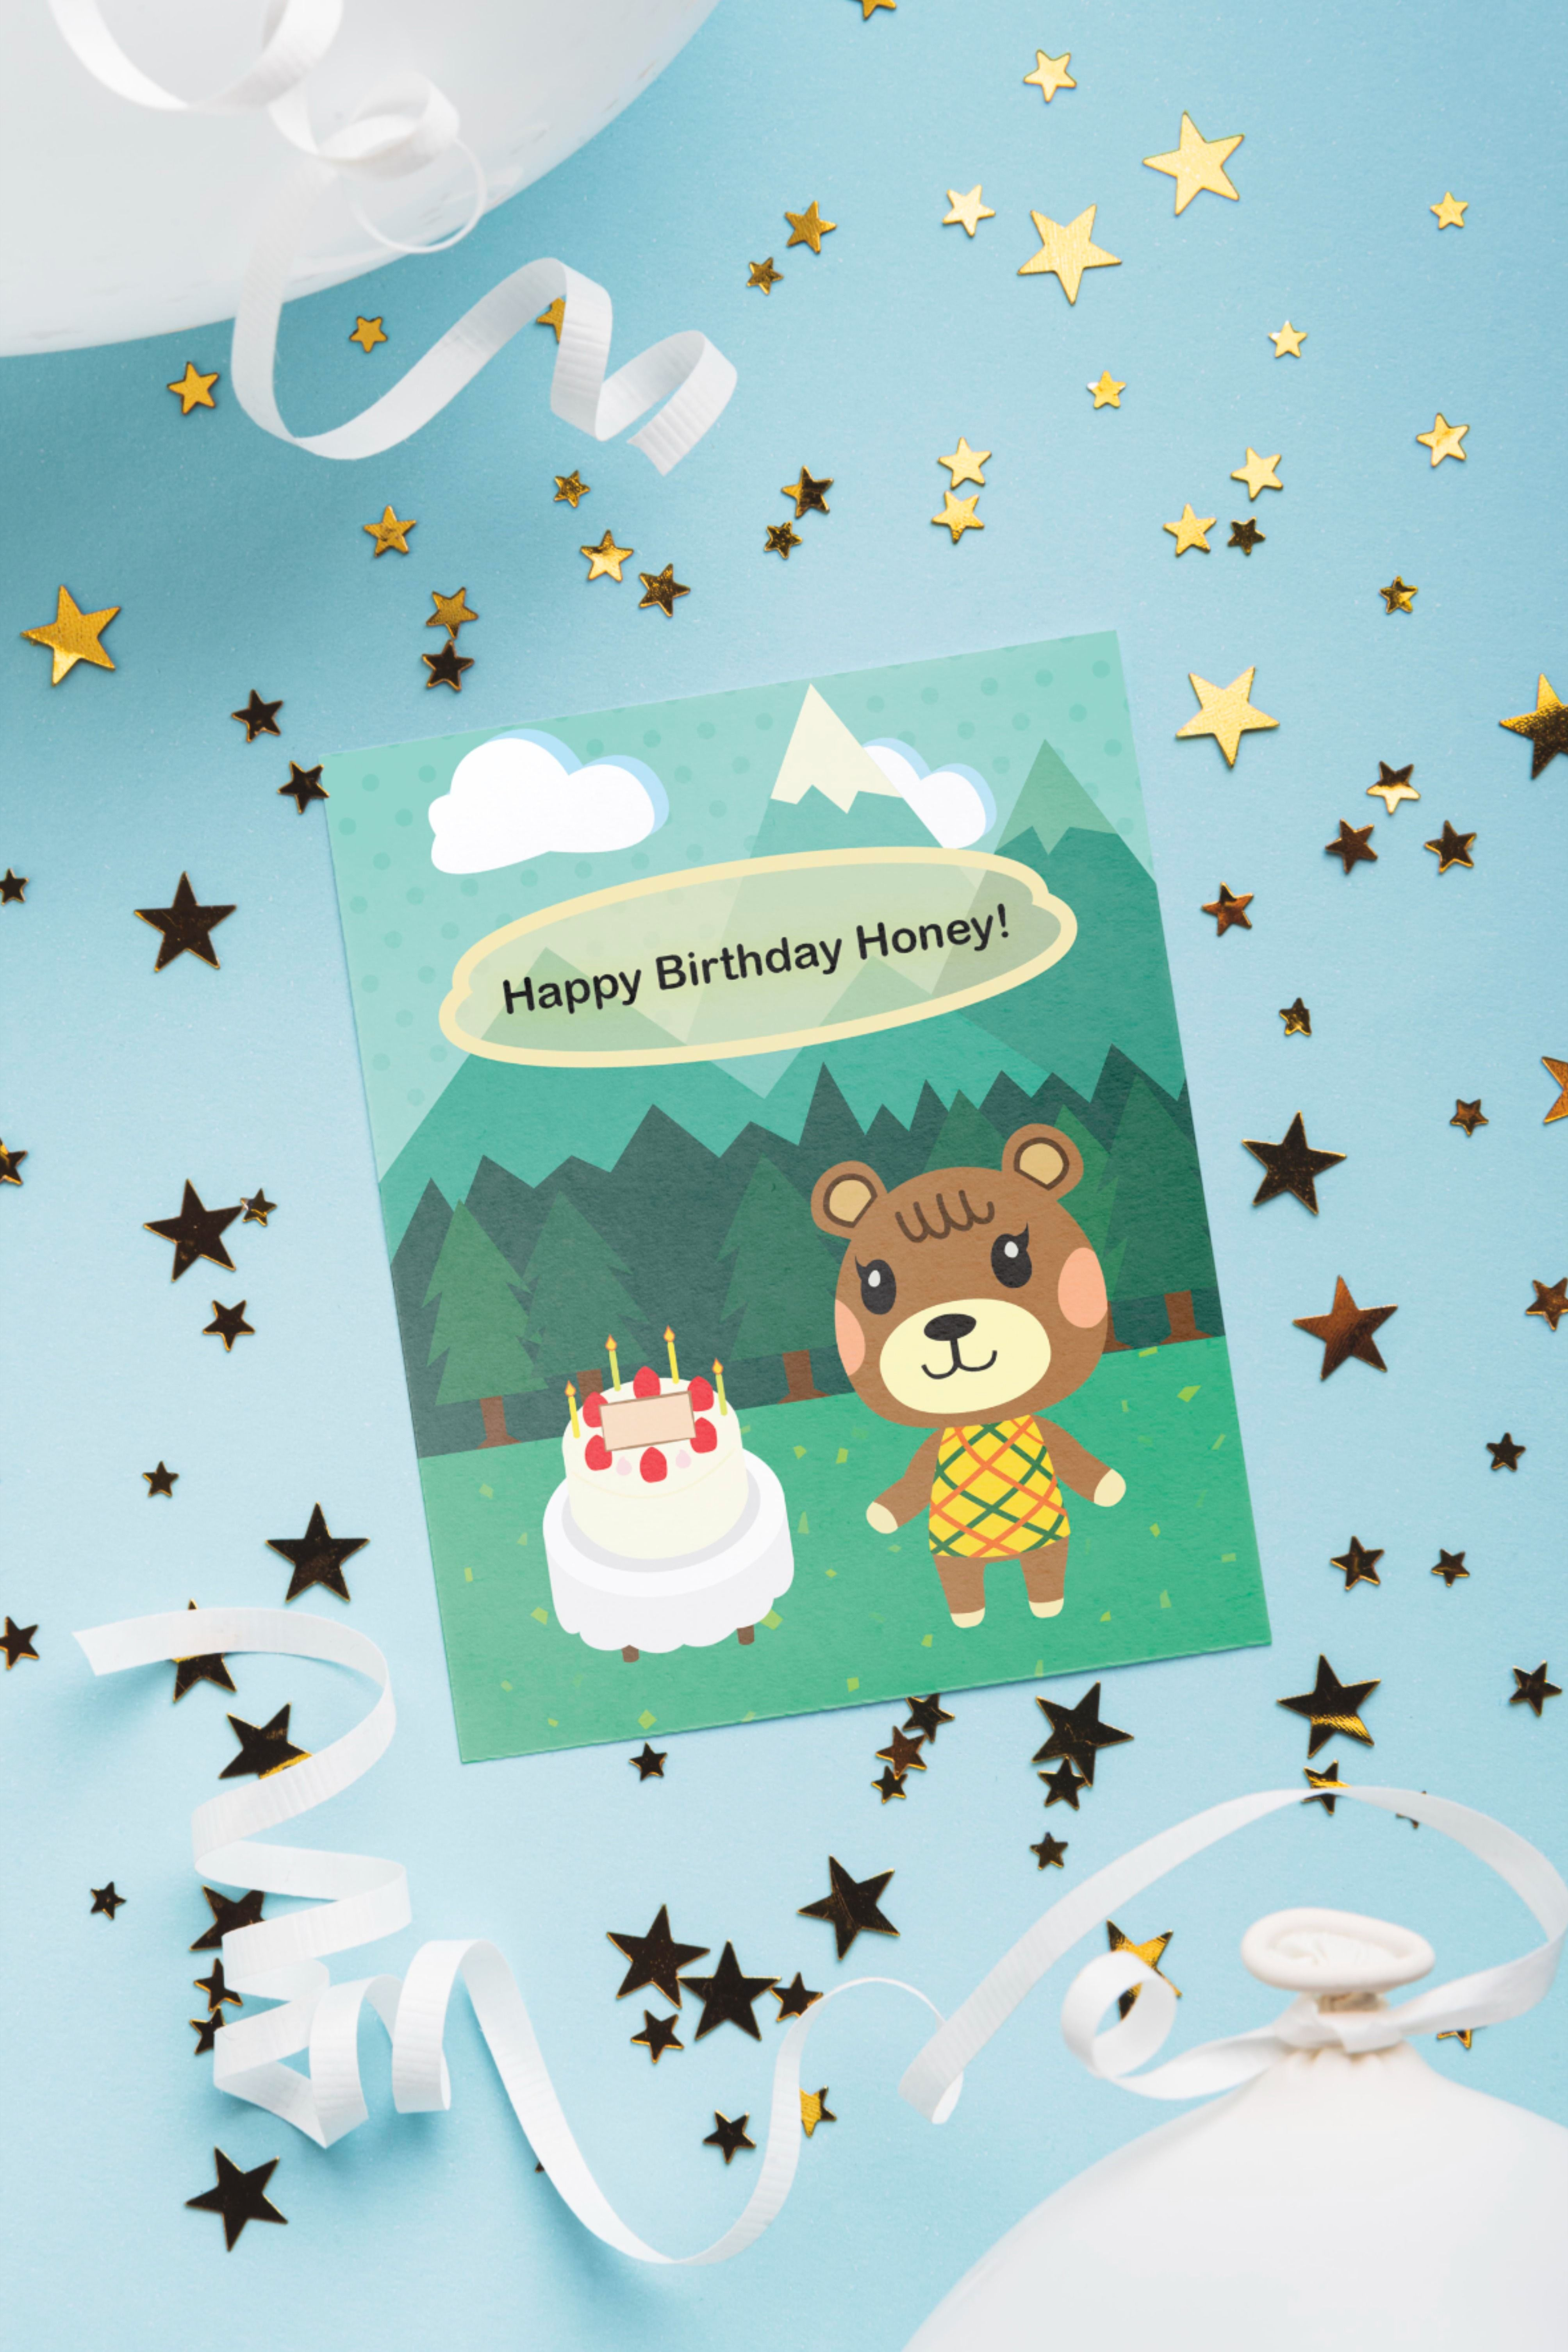 Maple Villager Birthday Card, Happy Birthday Honey, Cute ...